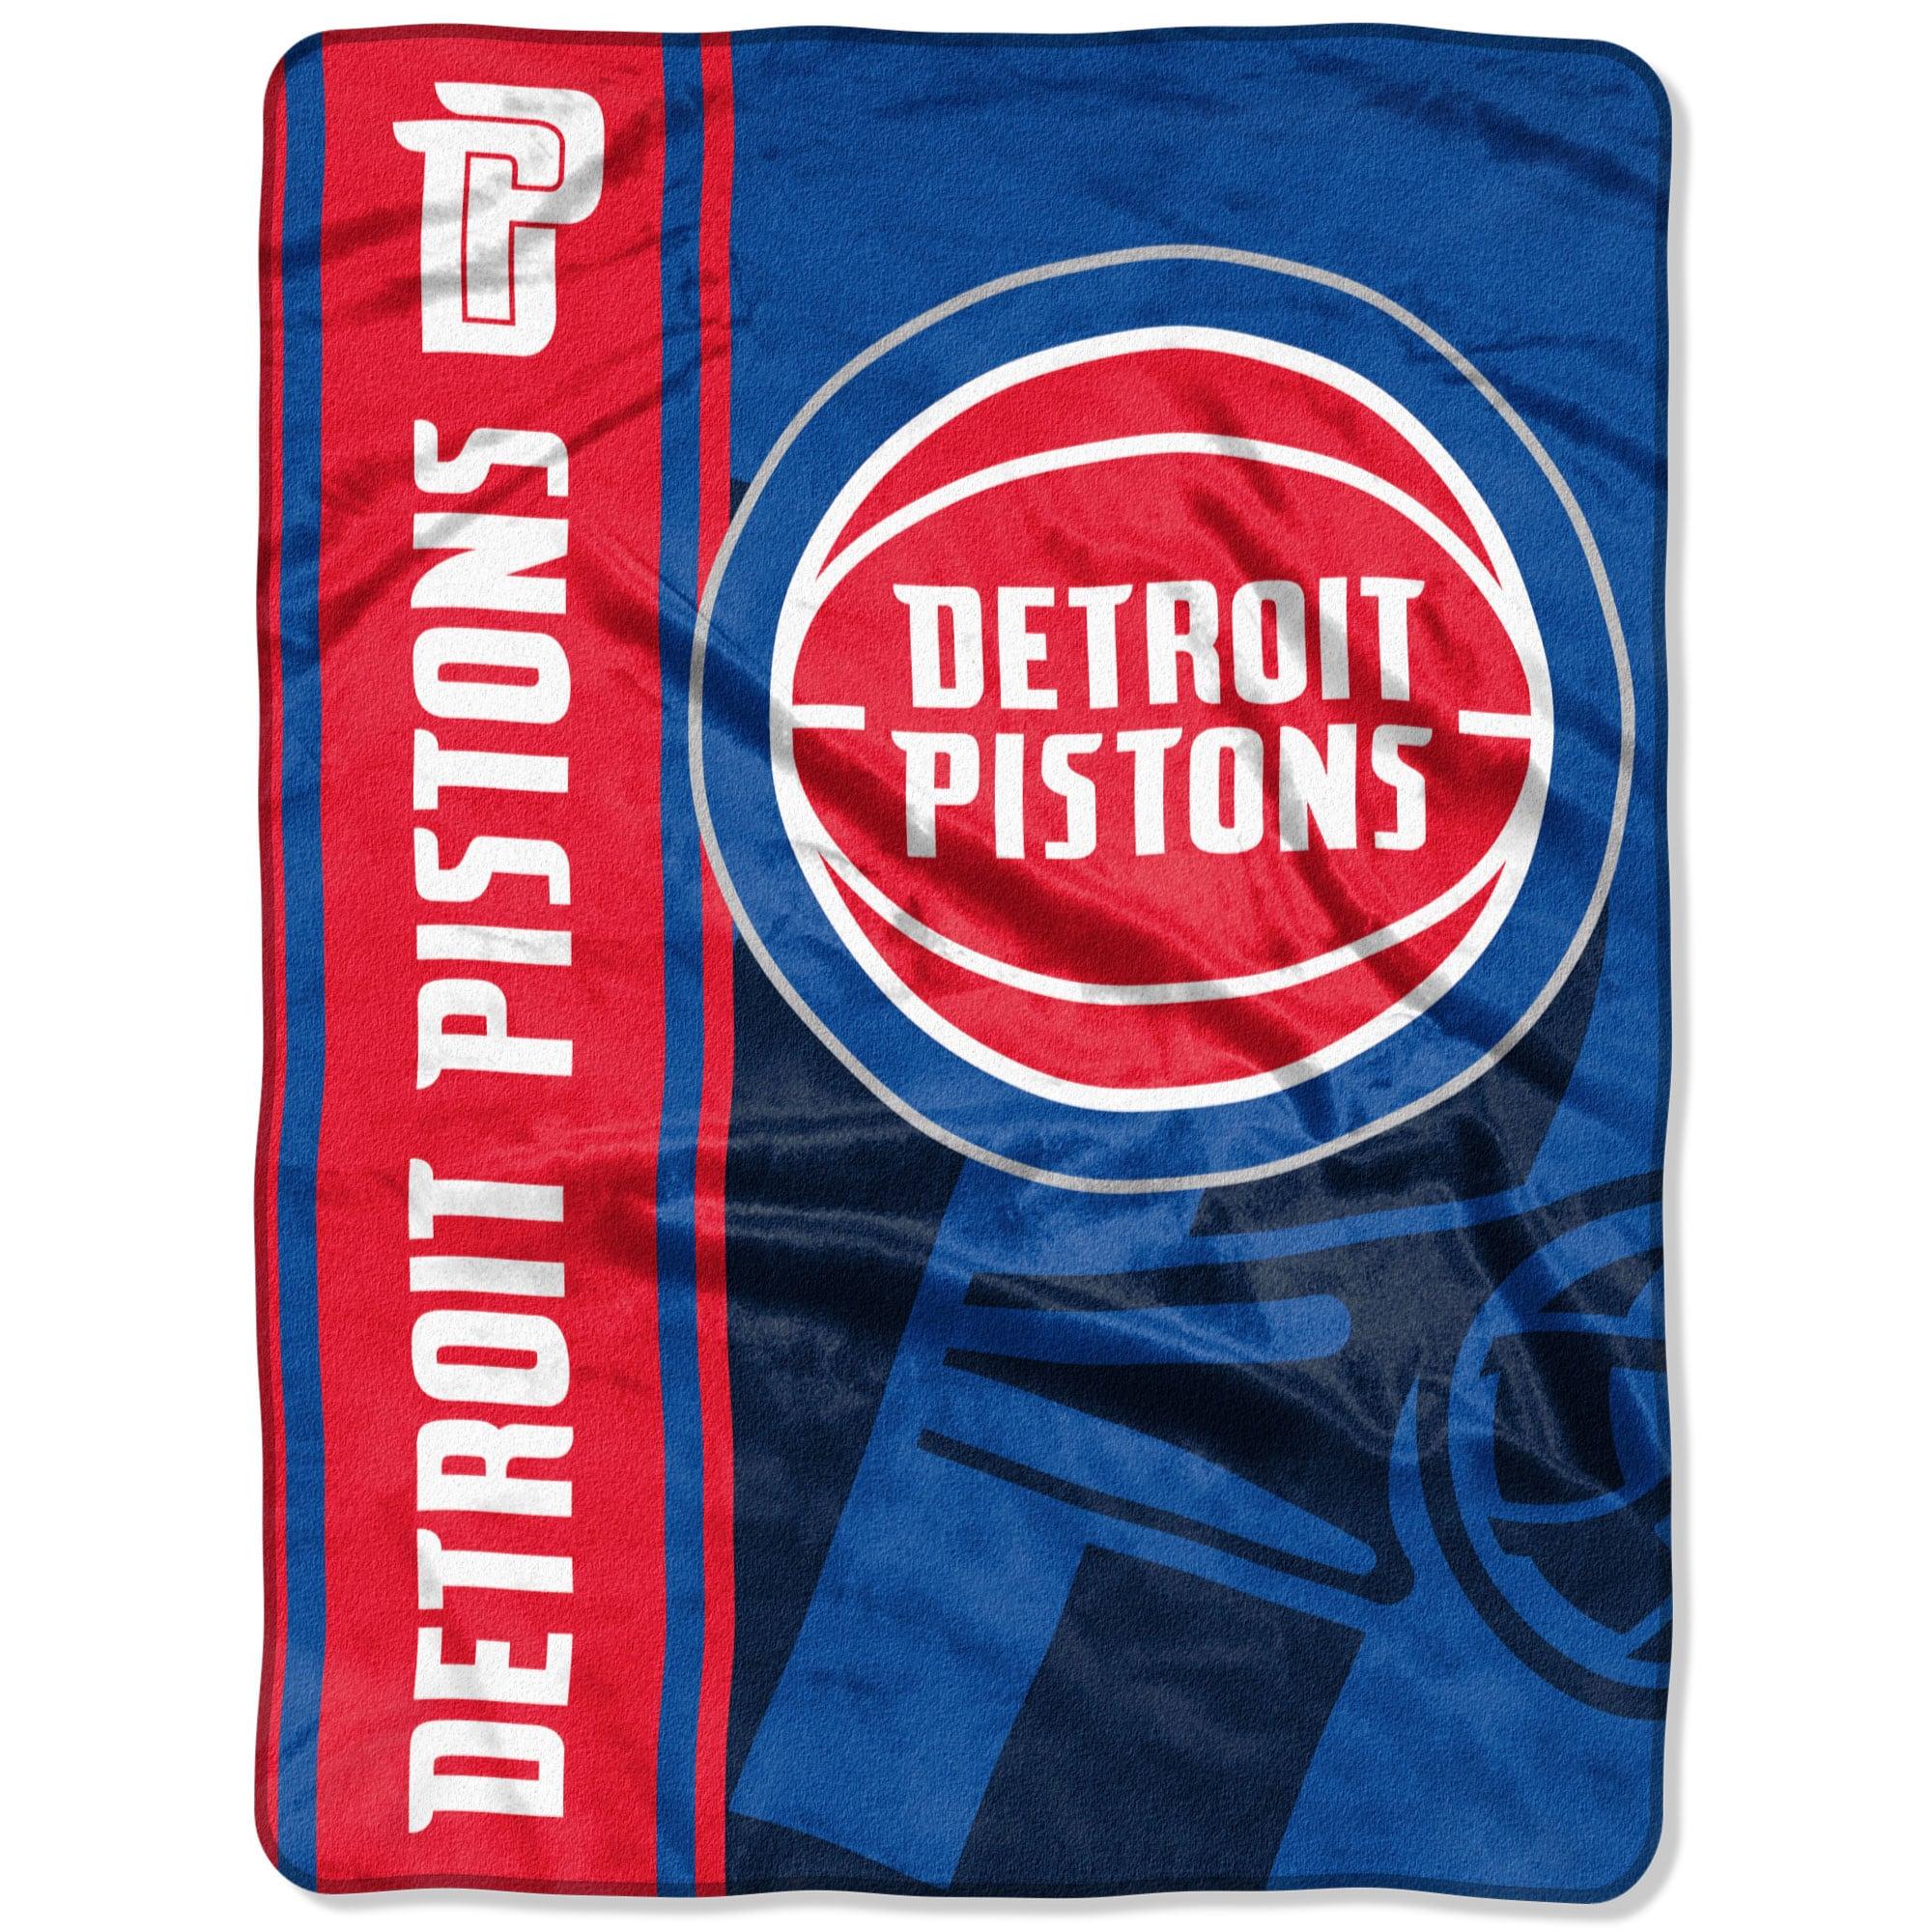 "Detroit Pistons The Northwest Company Hooper 60"" x 80"" Oversized Raschel Throw Blanket"